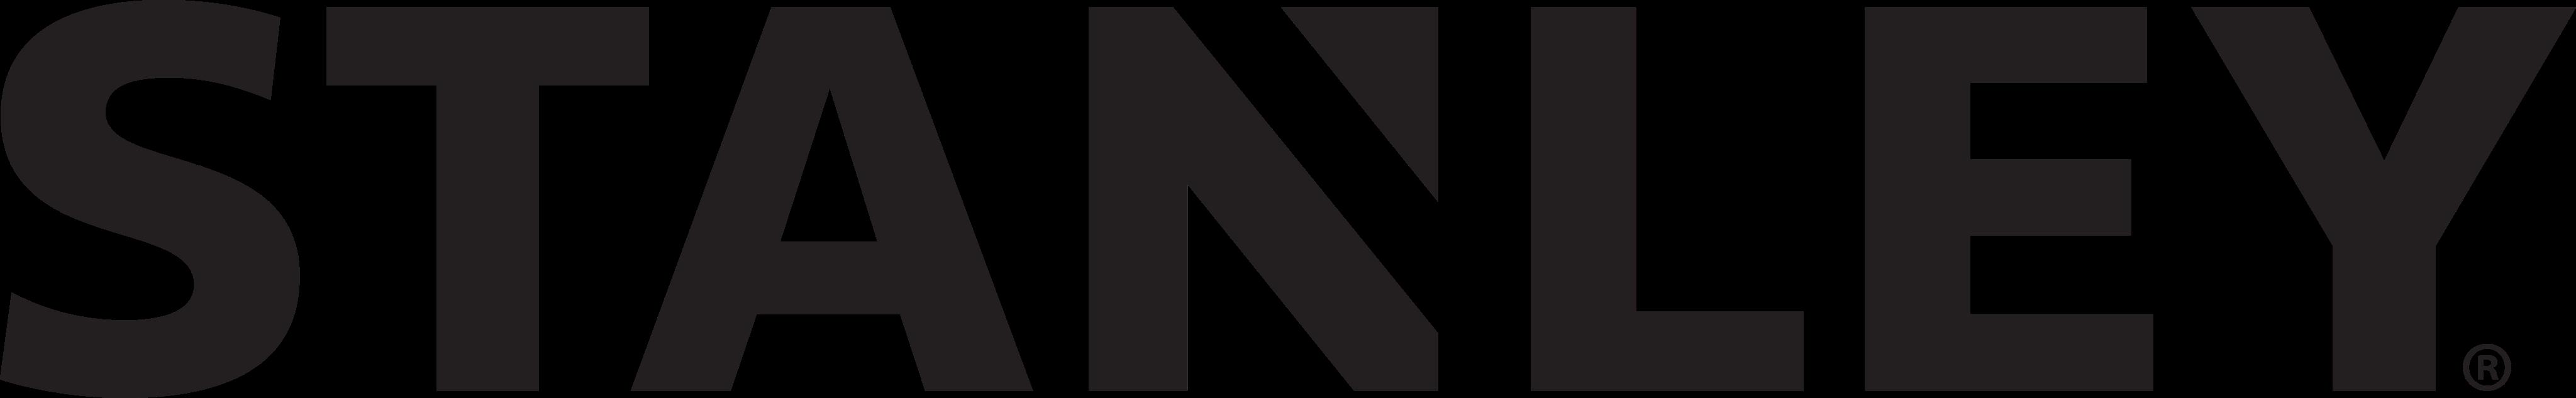 stanley logo 5 - Stanley Logo